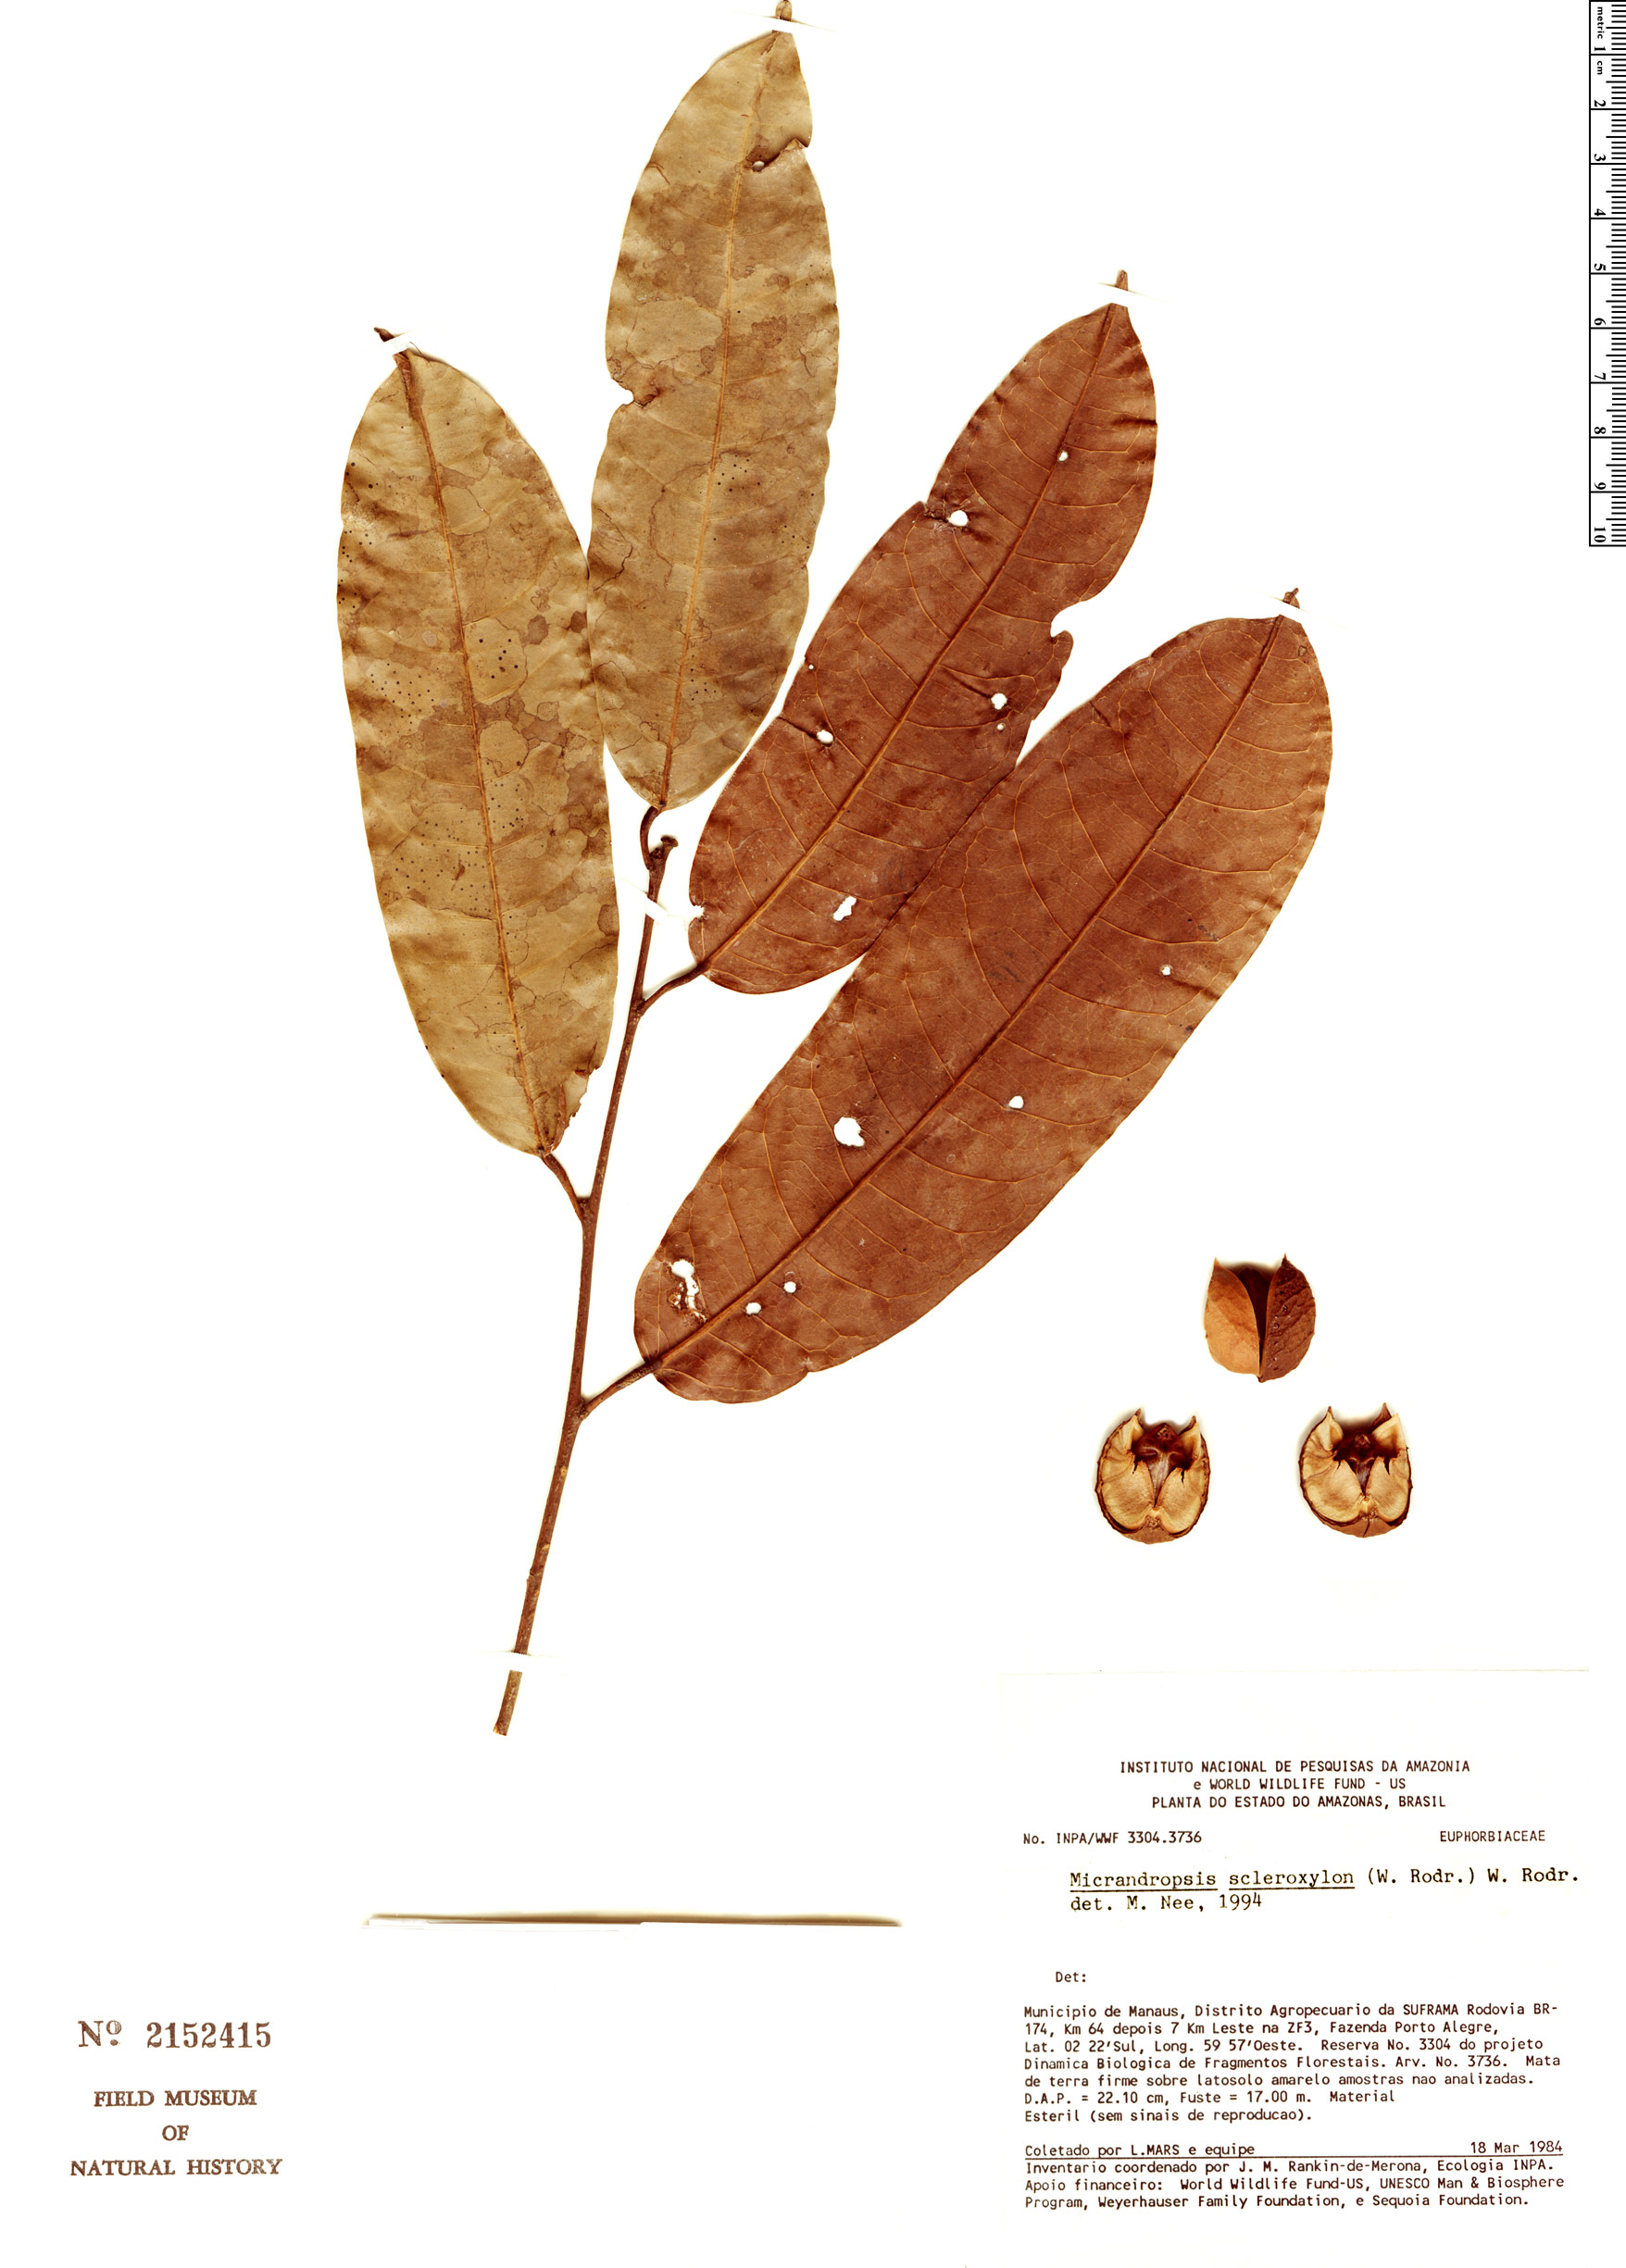 Specimen: Micrandropsis scleroxylon